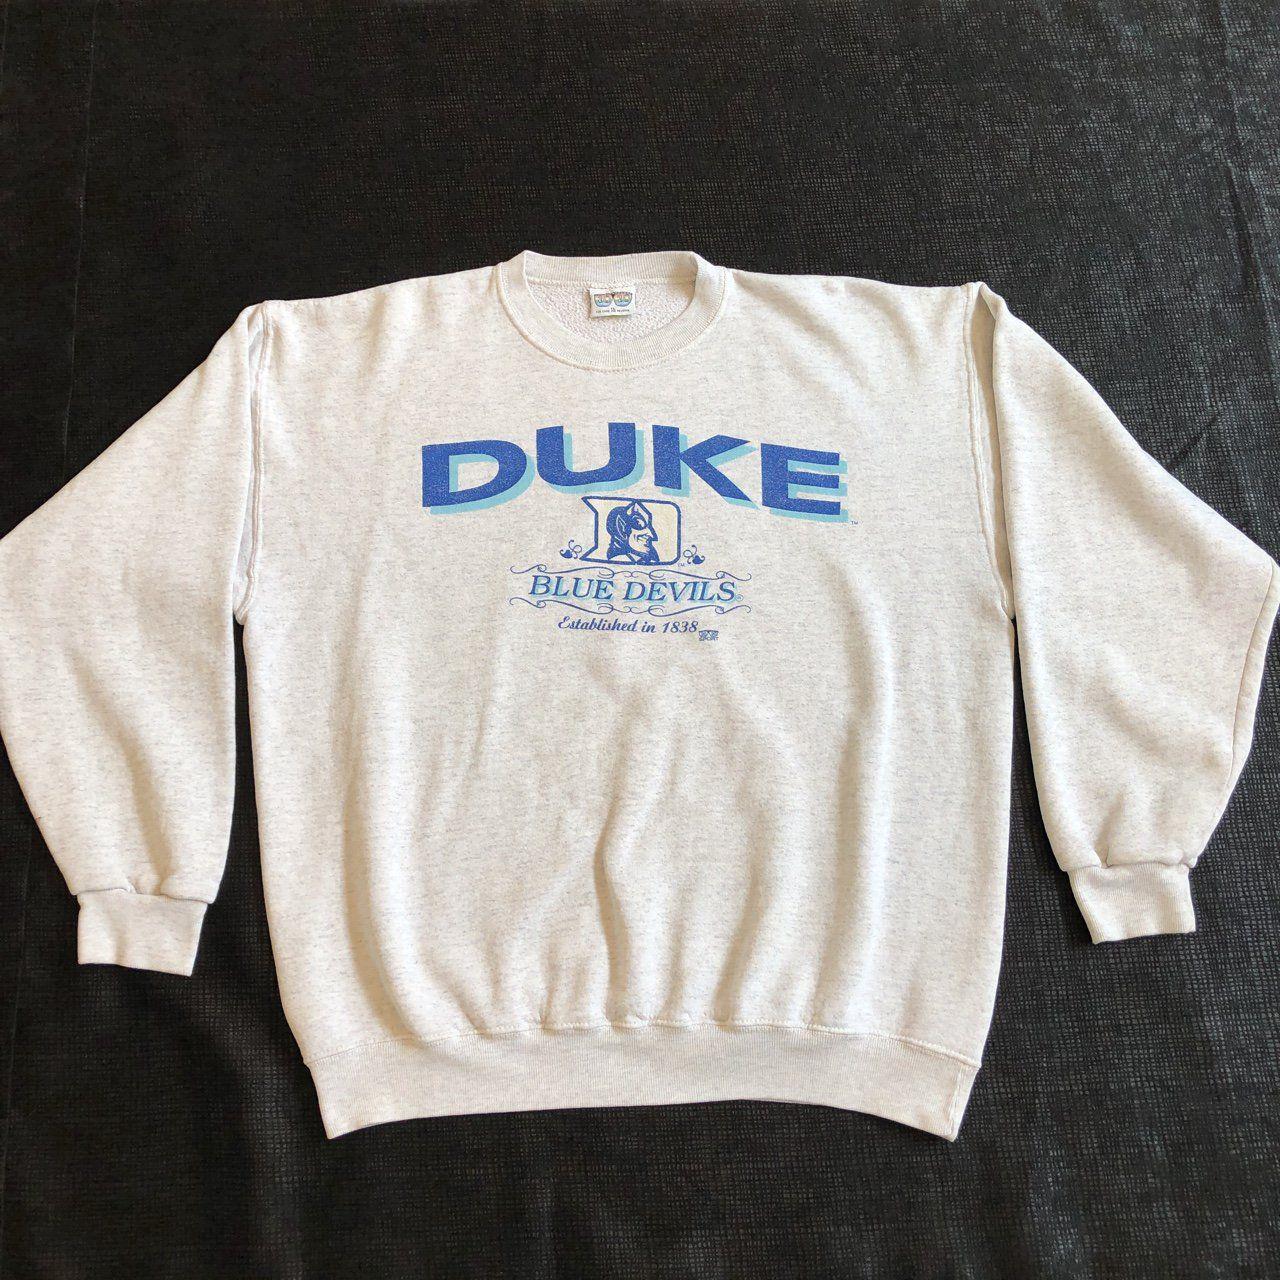 Vintage Duke Blue Devils Crewneck Sweatshirt By 20 Depop Vintage Crewneck Sweatshirt Crewneck Sweatshirt Outfit Vintage College Sweatshirts [ 1280 x 1280 Pixel ]